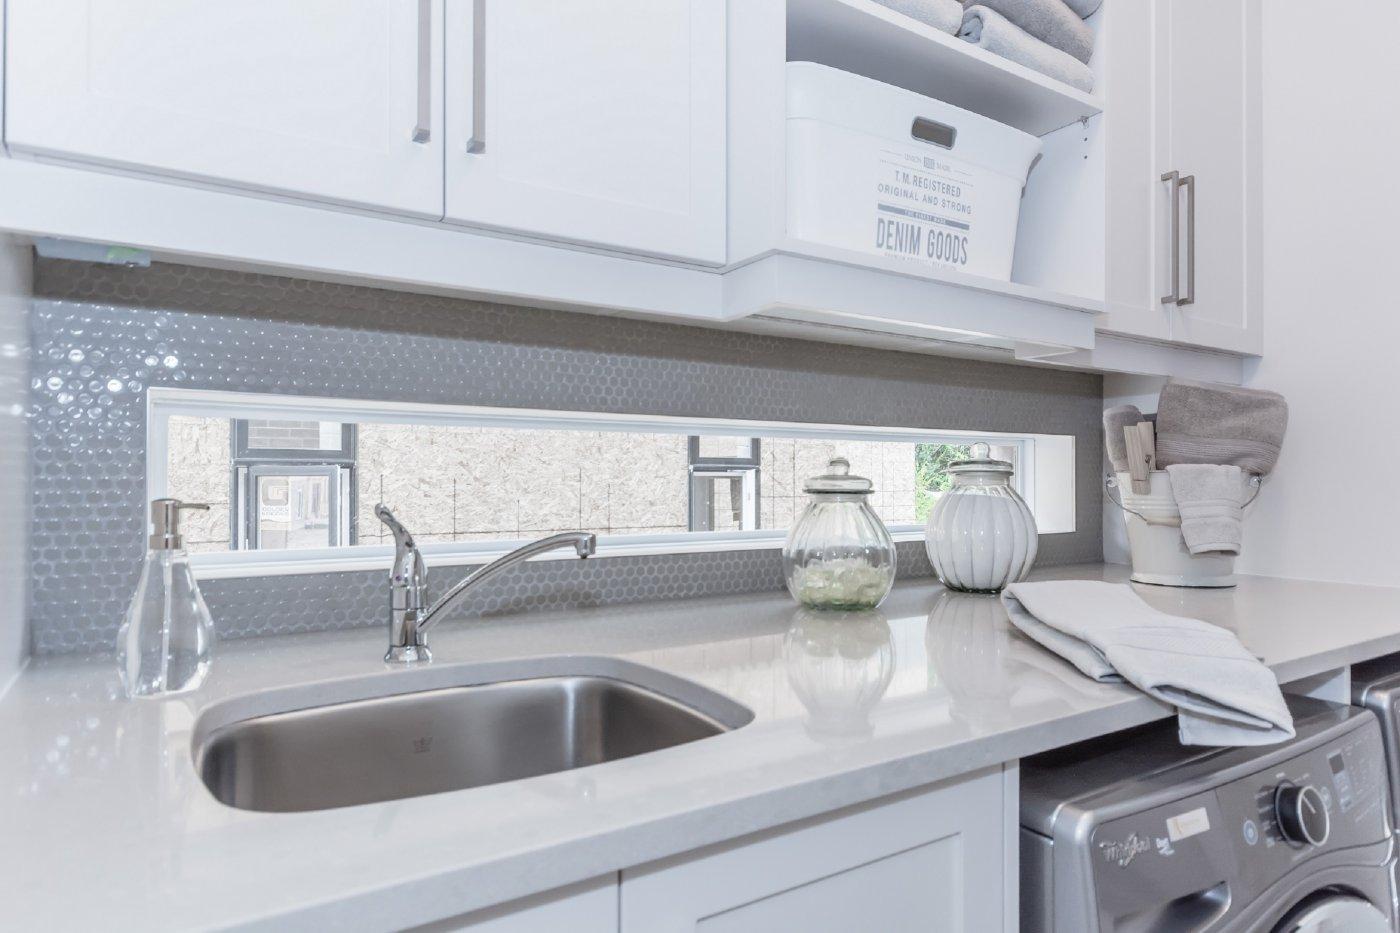 Contemporary Laundry Room Backsplash Ceramic Decor